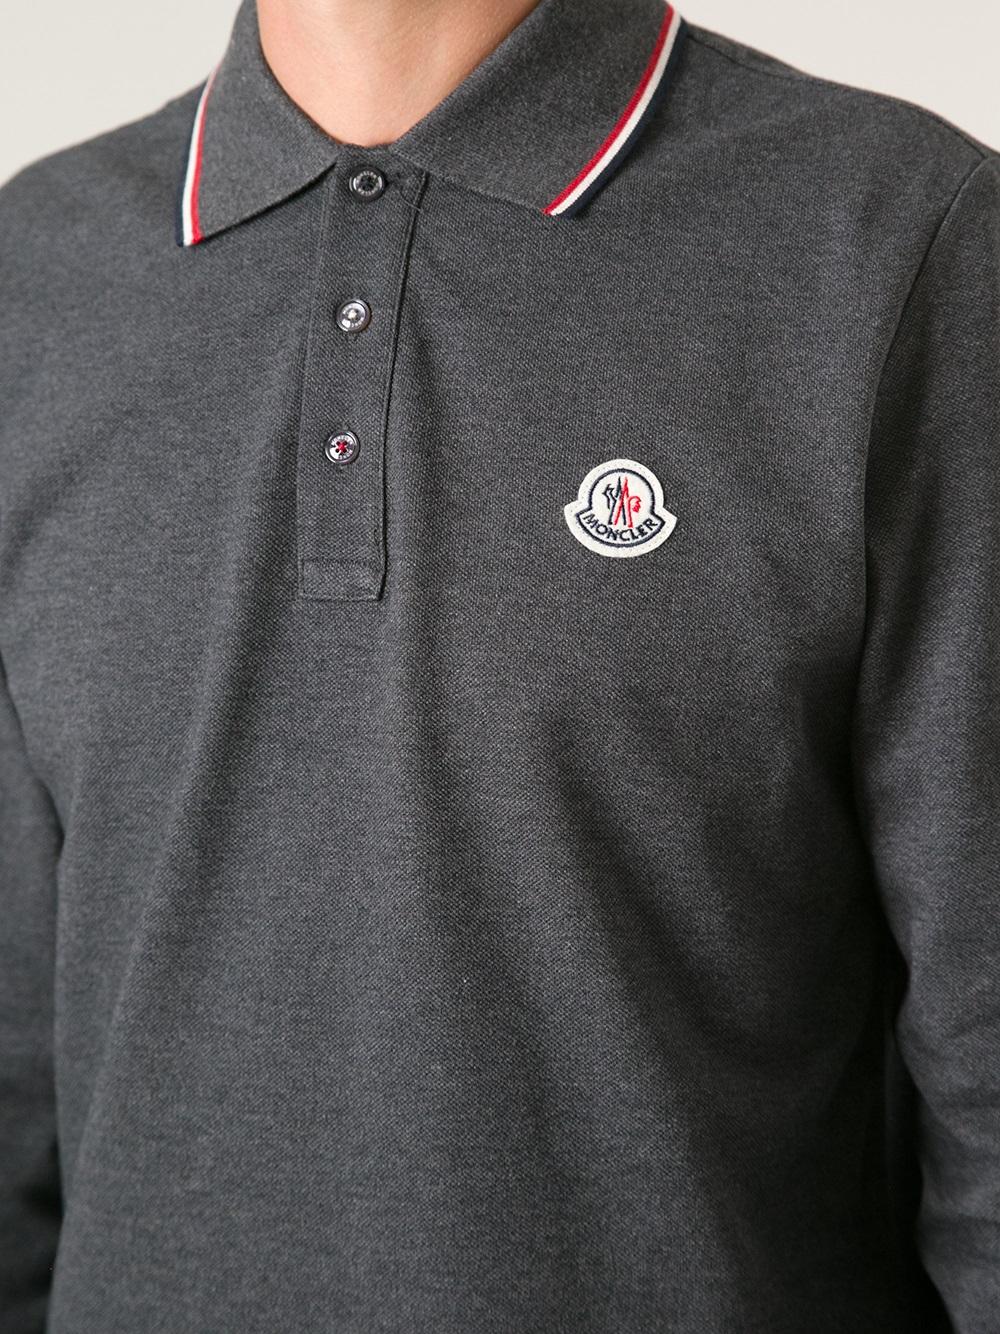 0bdeb19e6 Moncler Polo Shirts Mens Sale « Alzheimer's Network of Oregon